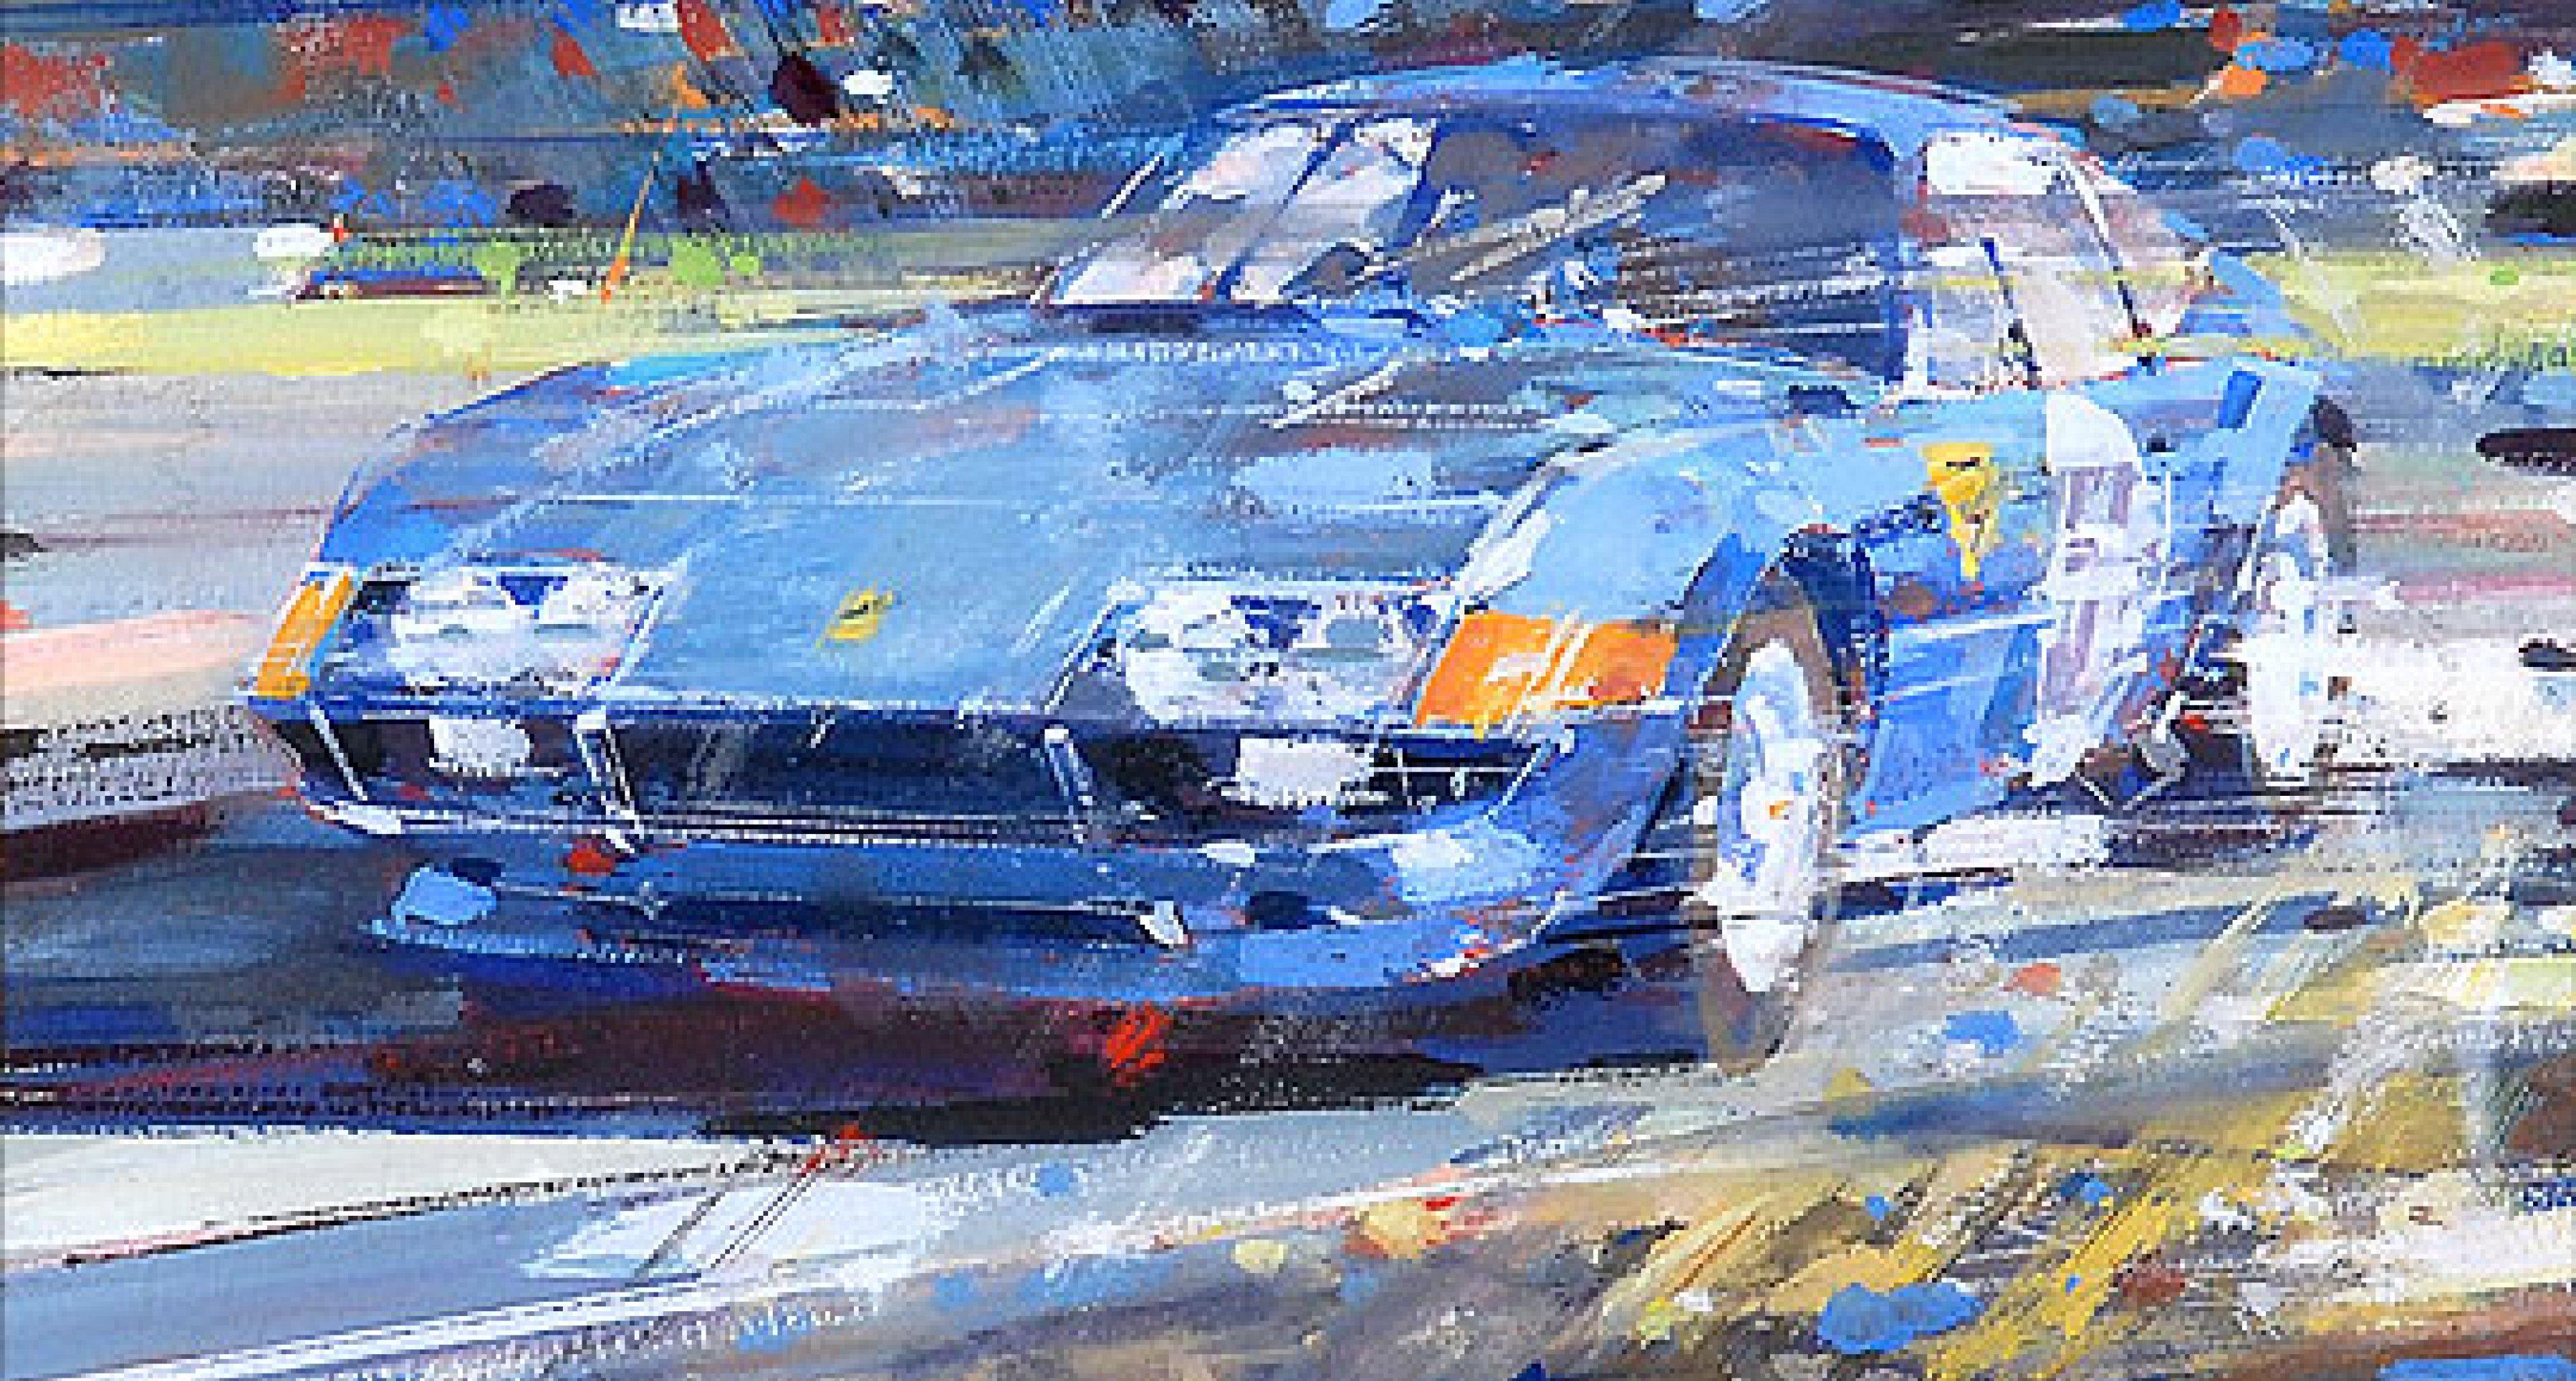 Superfast: The Ferrari Paintings of Dexter Brown